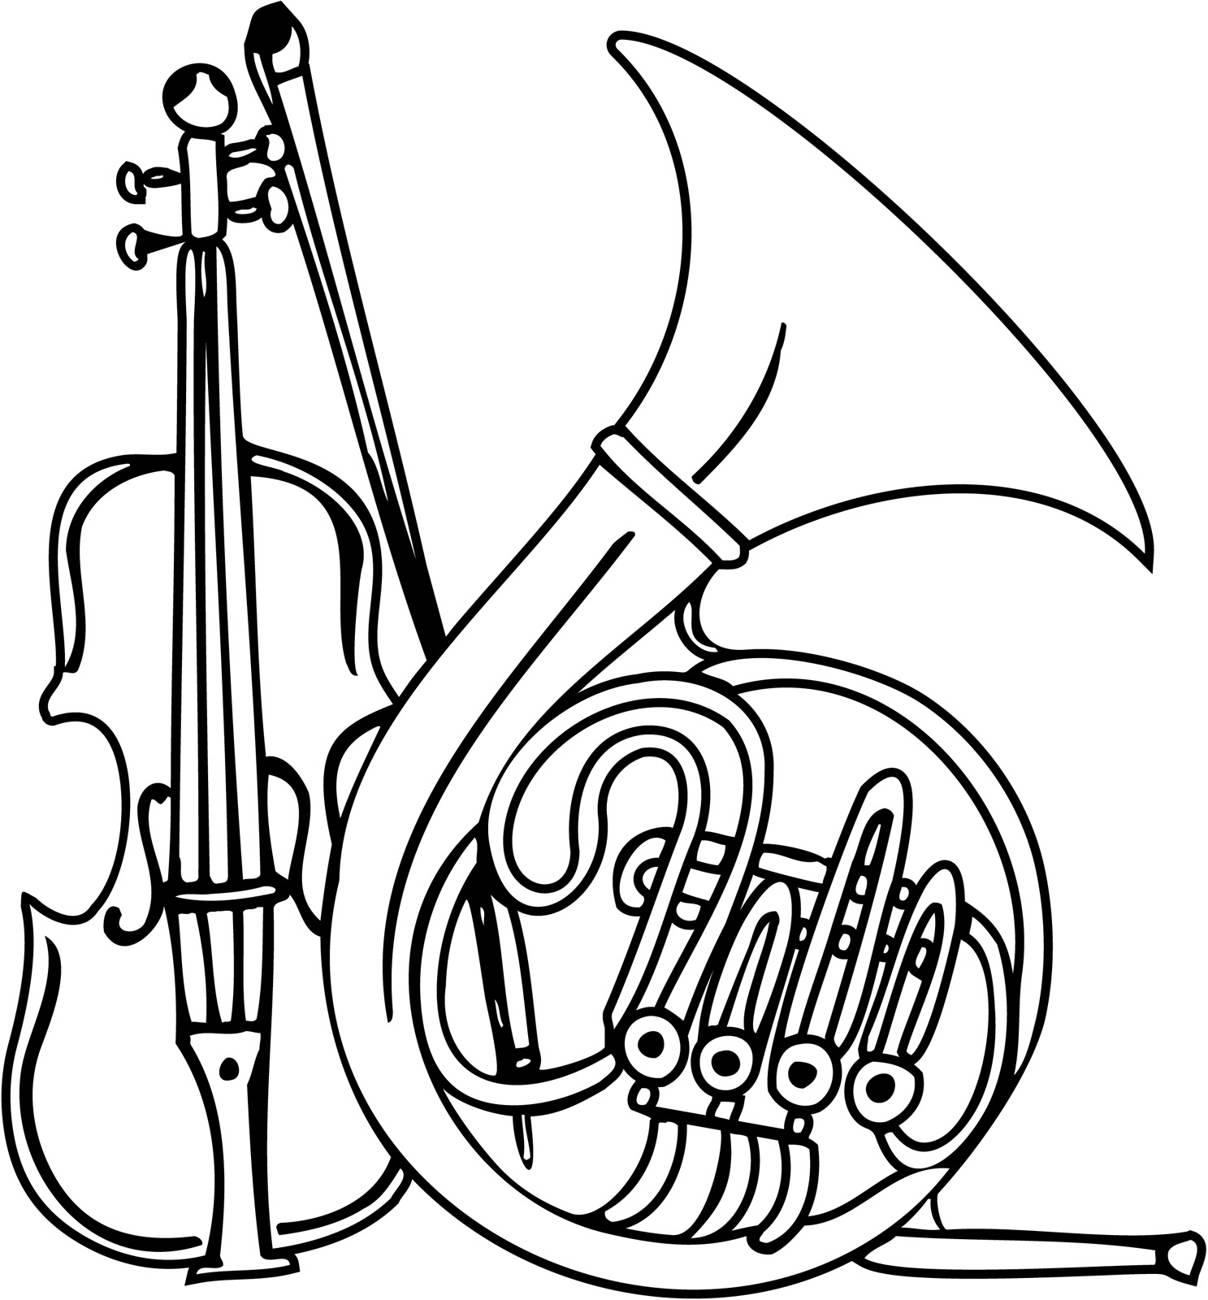 MUSIC-089